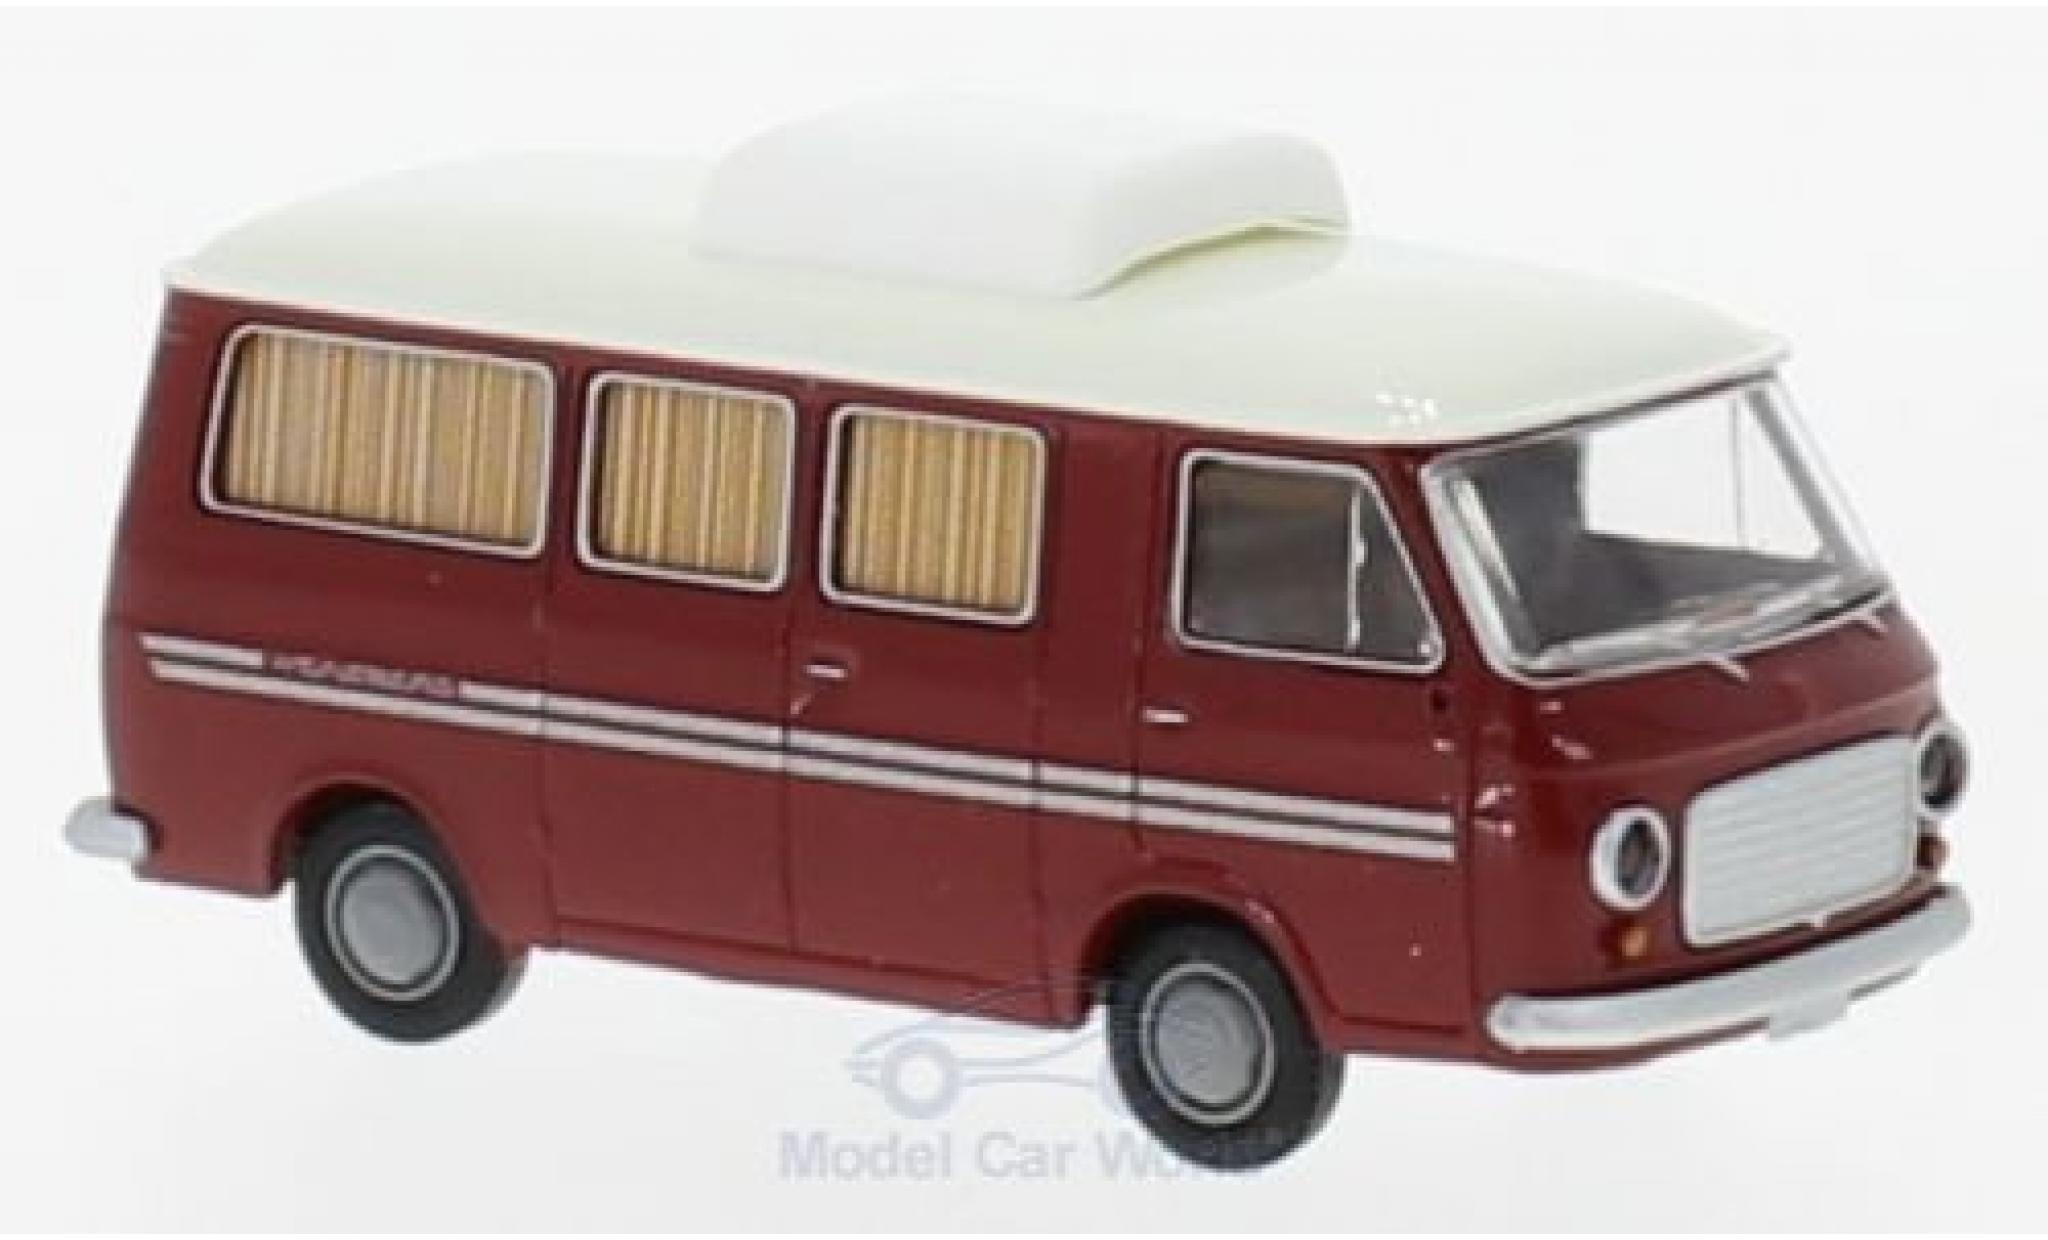 Fiat 238 1/87 Brekina Camper Weinsberg red